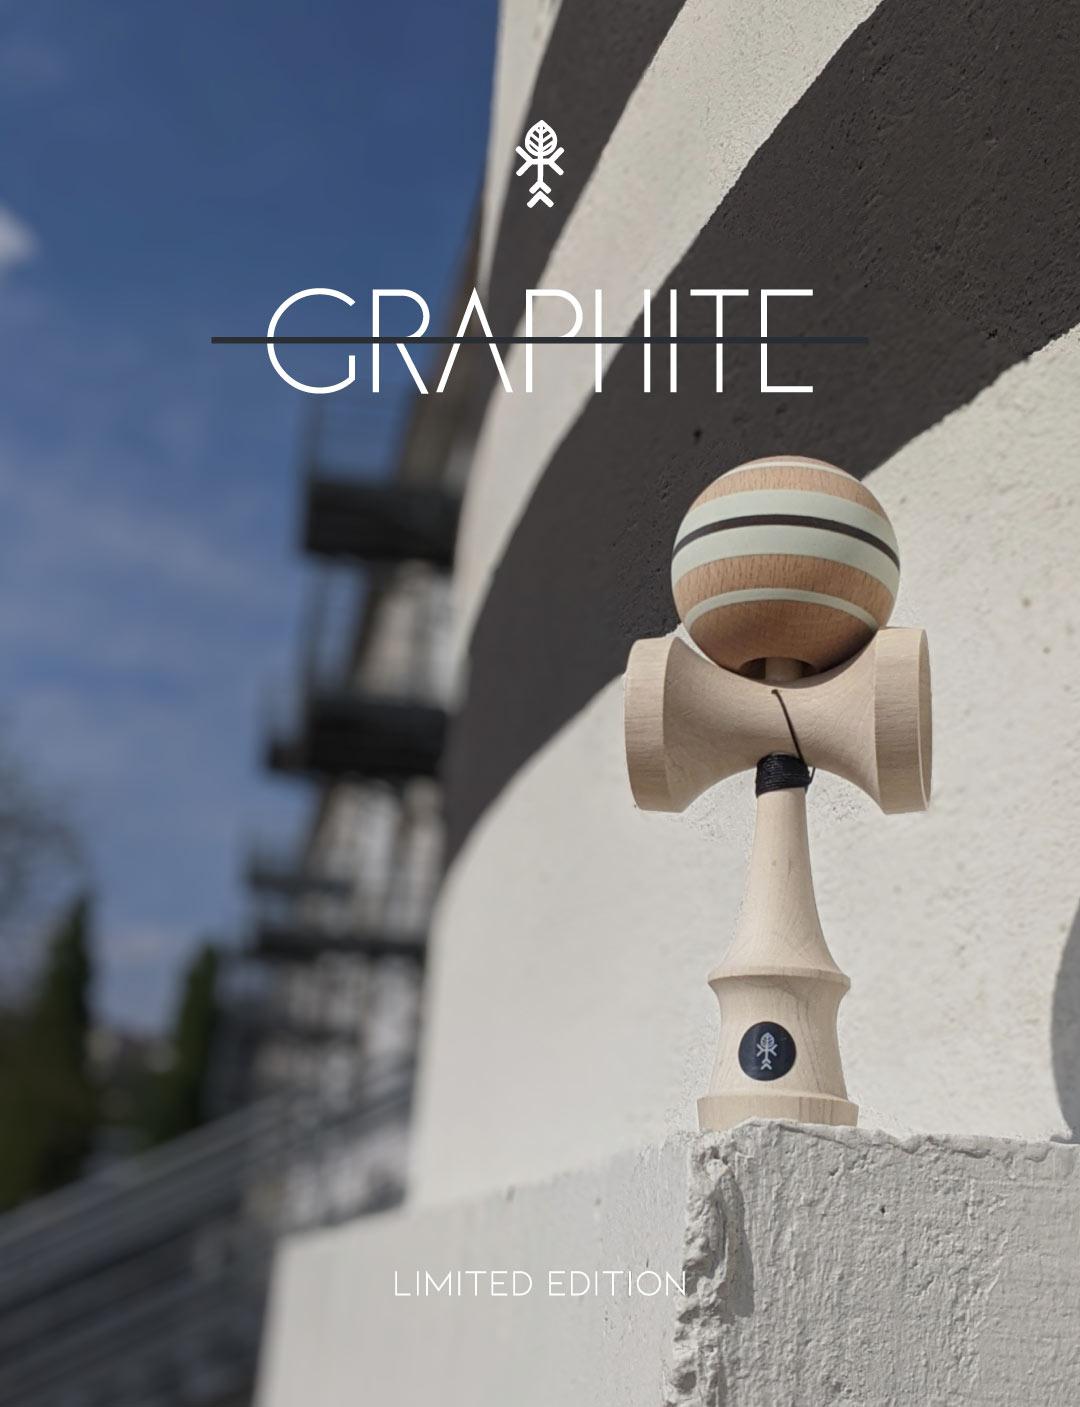 kendama_nativ_page_graphite_1